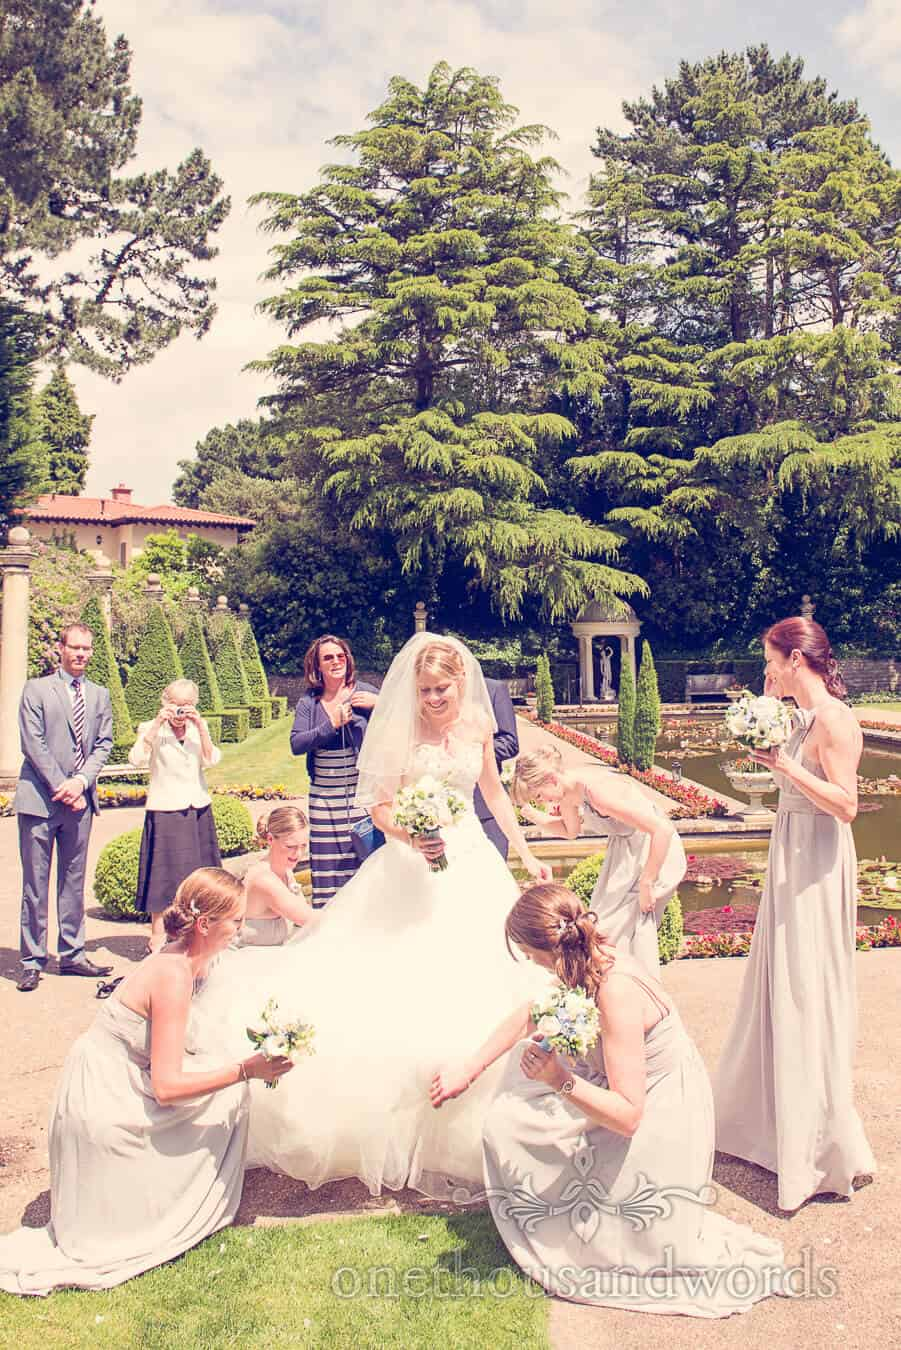 Wedding dress is adjusted by bridesmaids in gardens at Italian Villa Wedding